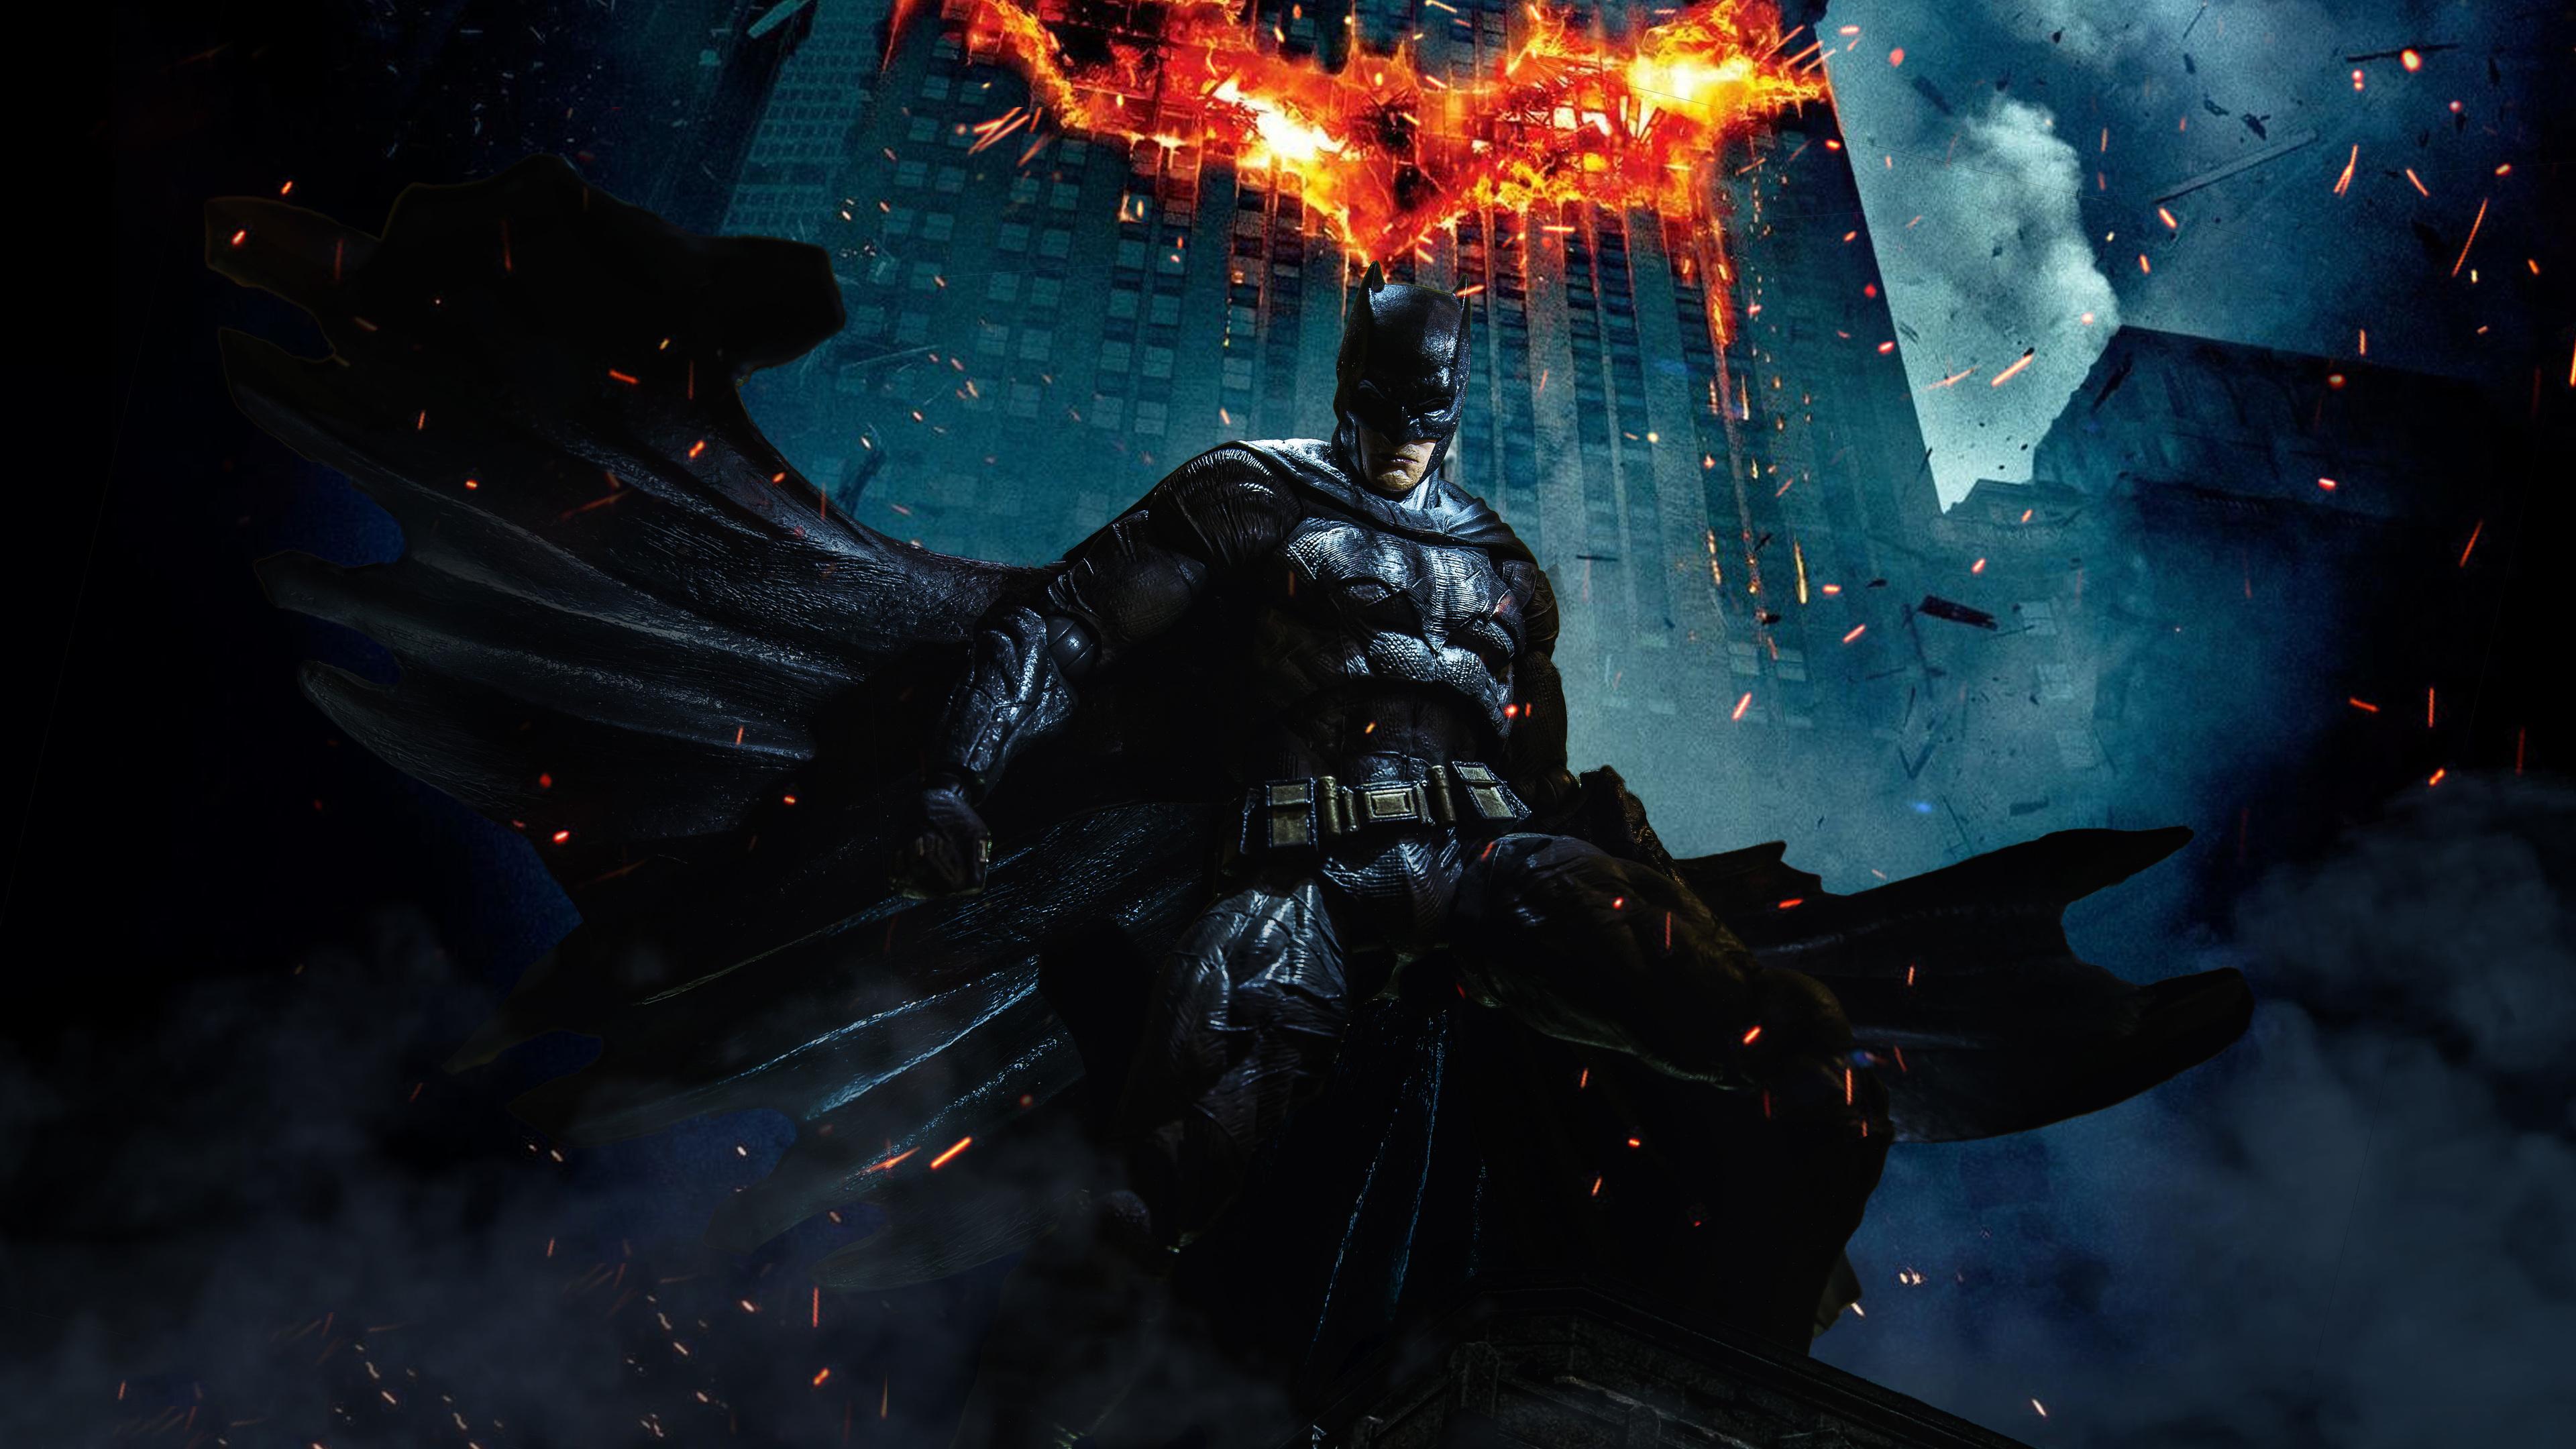 batman dark knight 5k 1538786523 - Batman Dark Knight 5k - superheroes wallpapers, hd-wallpapers, digital art wallpapers, batman wallpapers, artwork wallpapers, art wallpapers, 5k wallpapers, 4k-wallpapers